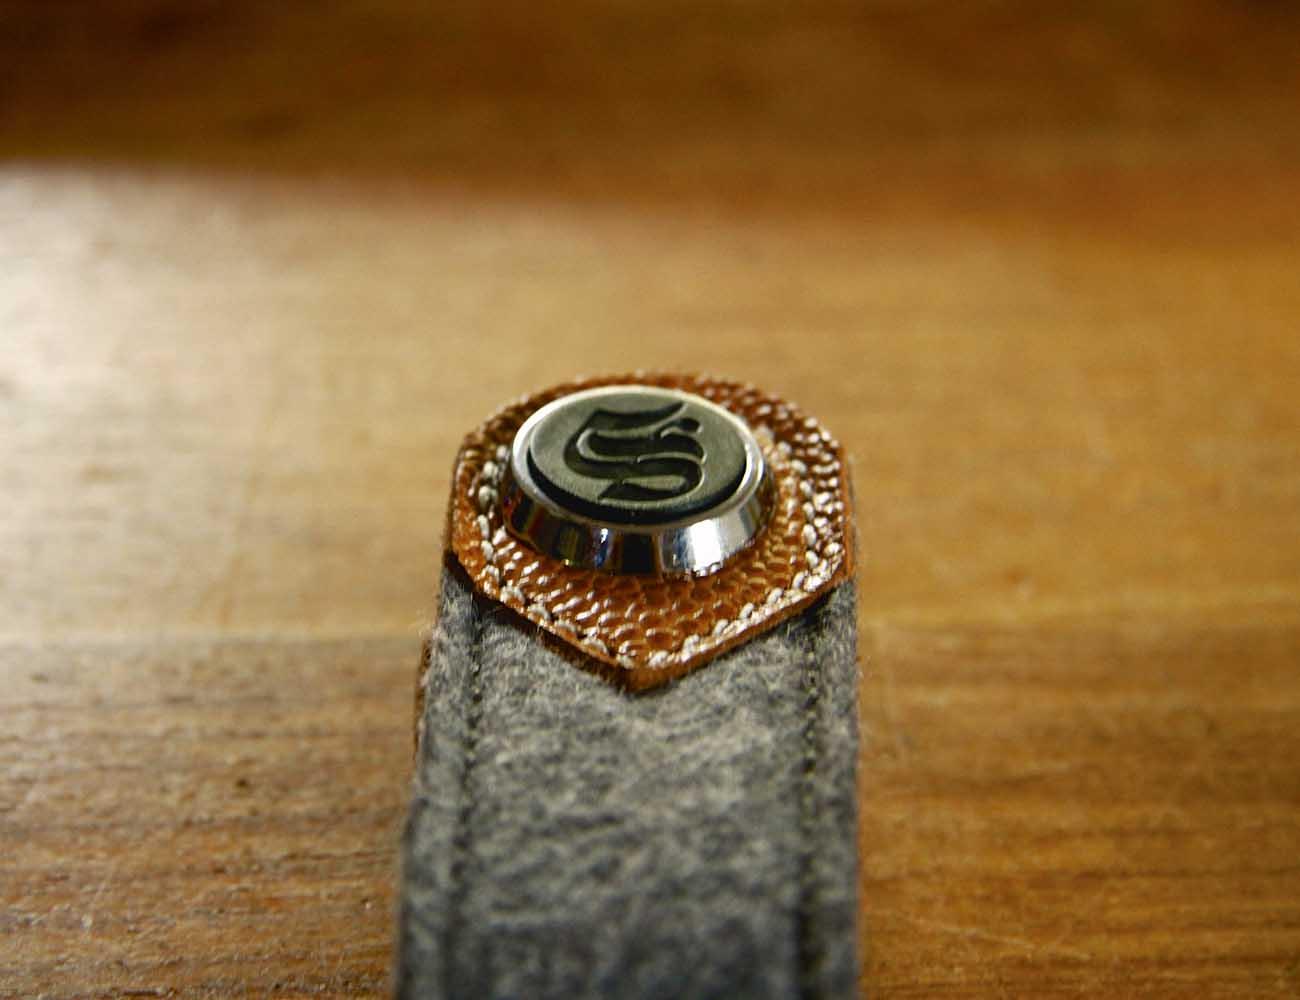 Brown Leather and Wool Felt Key Organizer by S-Key